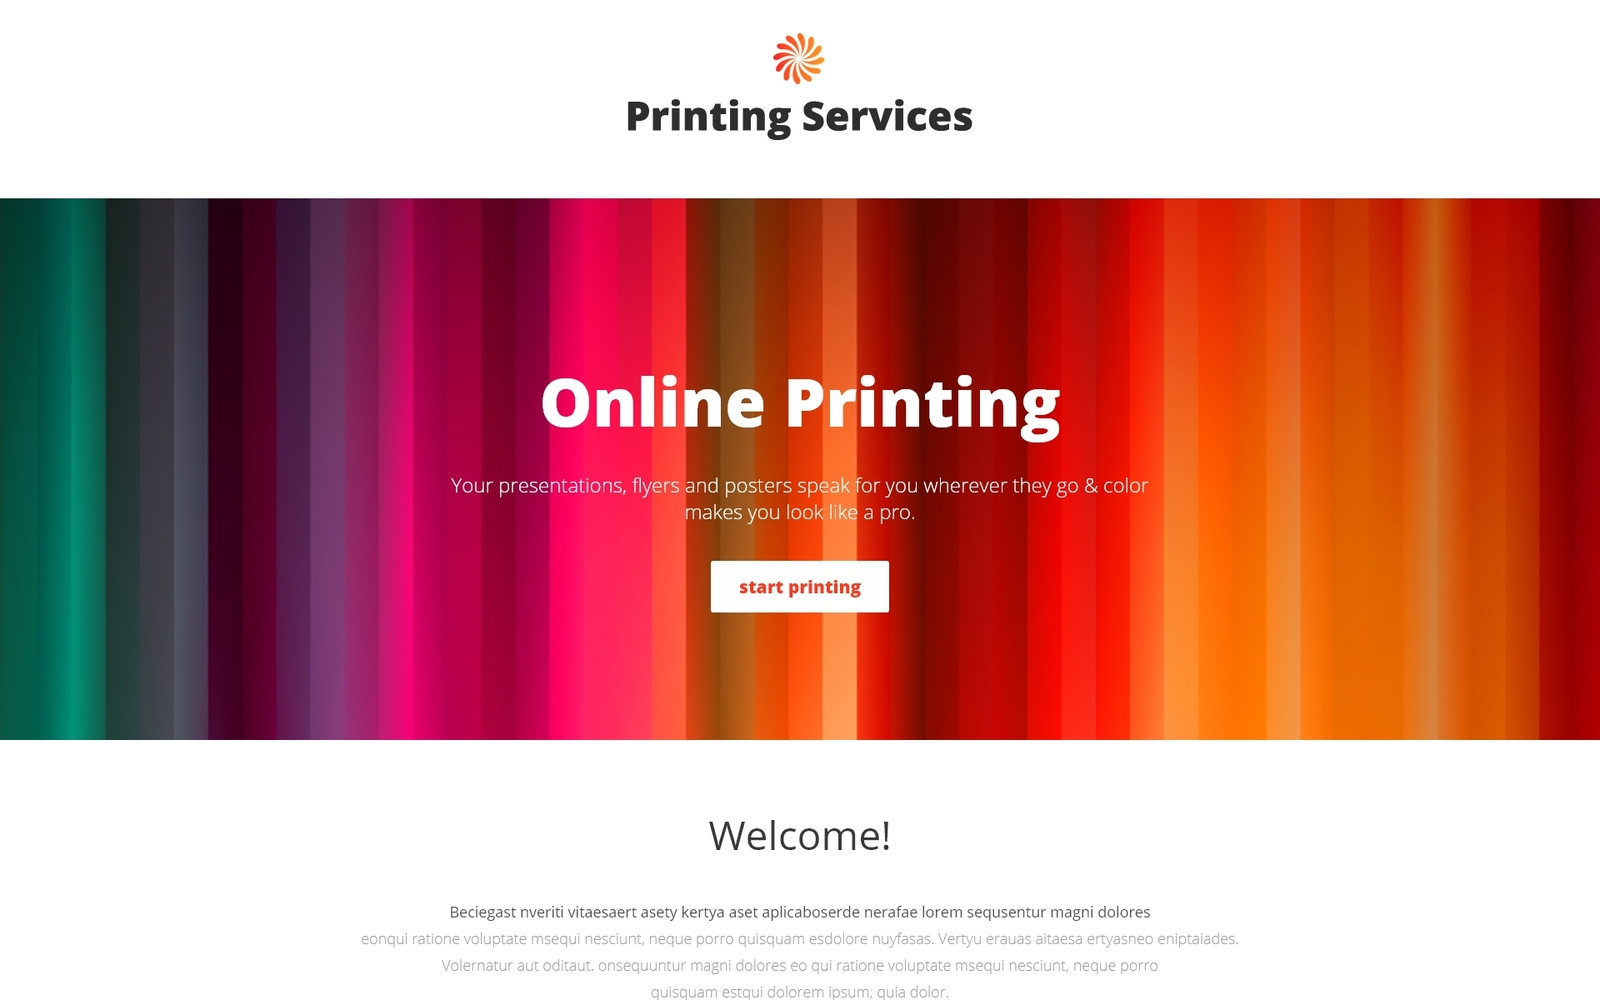 """Printing Services - Online Printing with Novi Builder"" - адаптивний Шаблон цільової сторінки №67261"